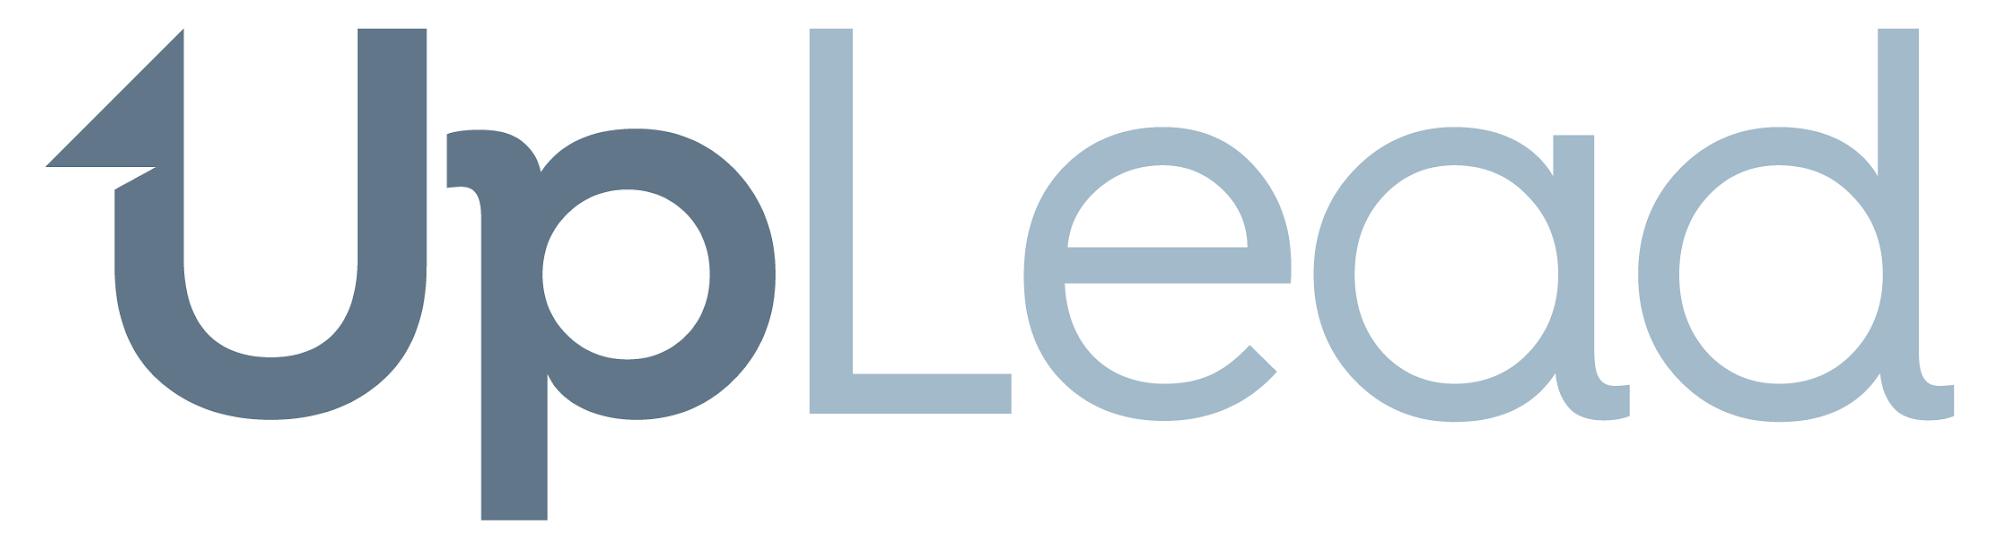 UpLead - business leads